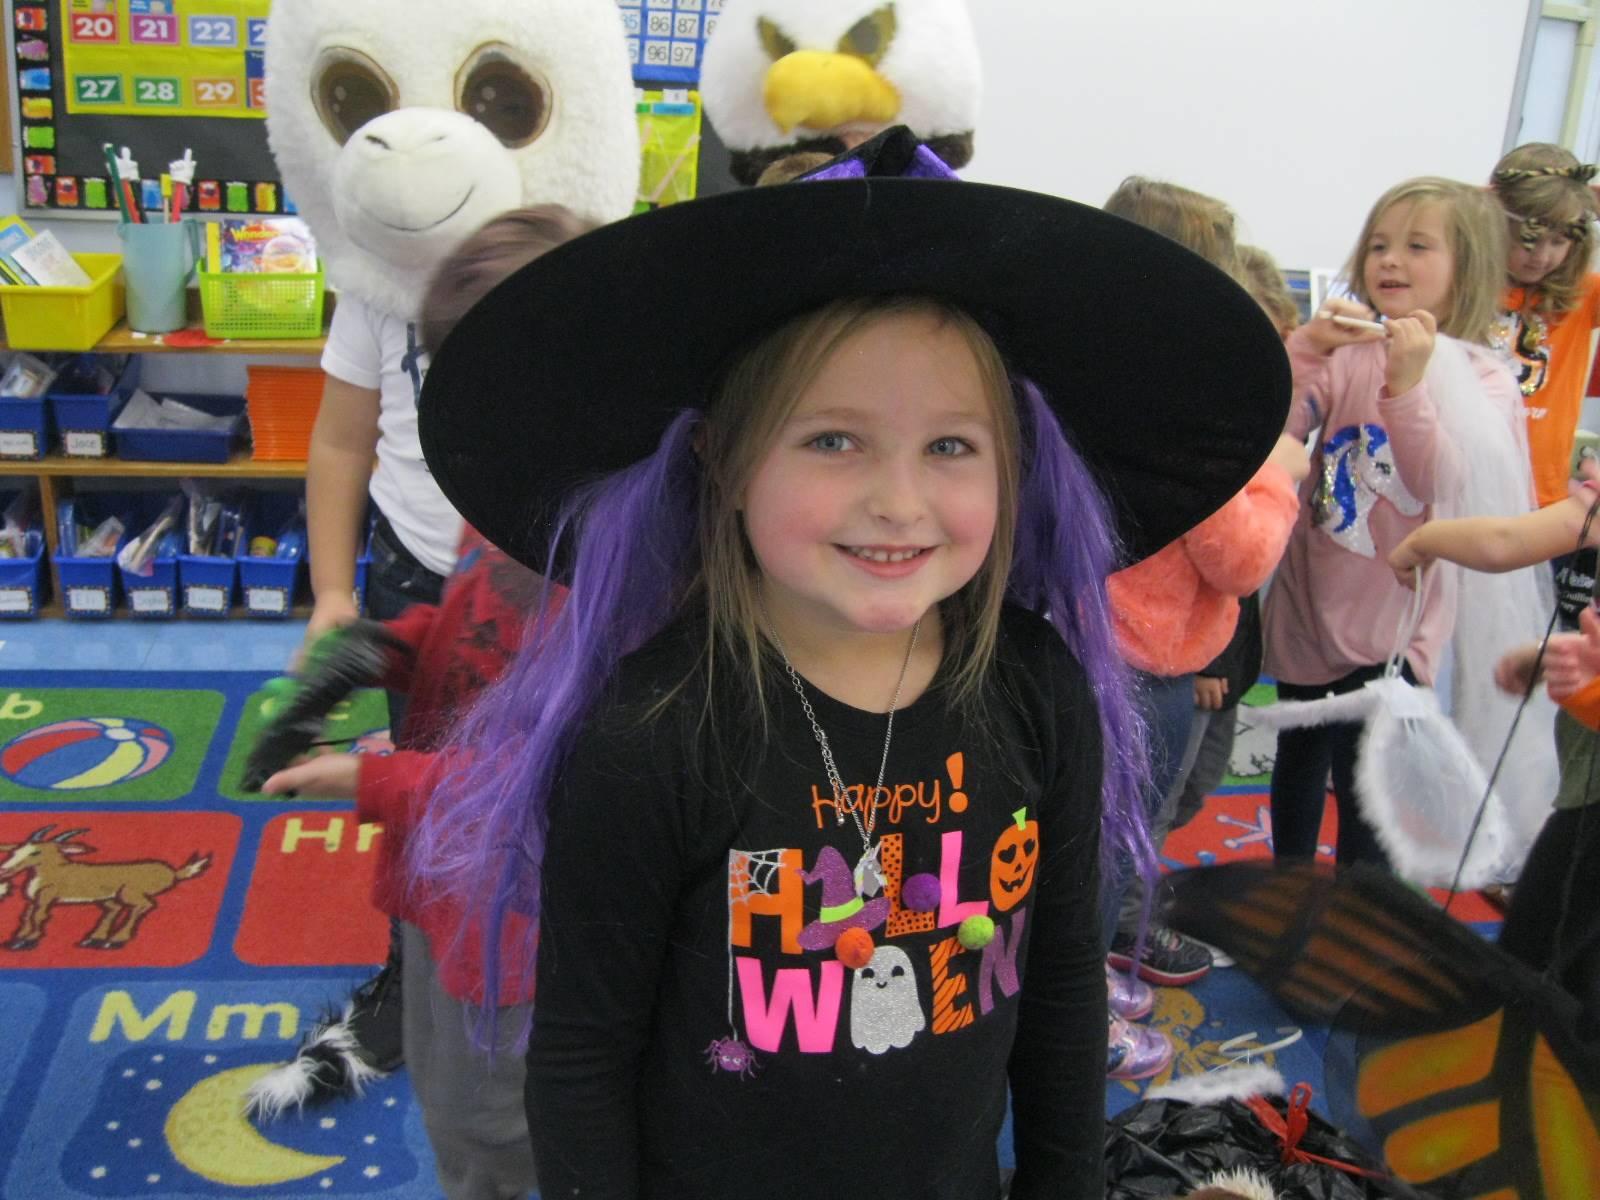 A witch!